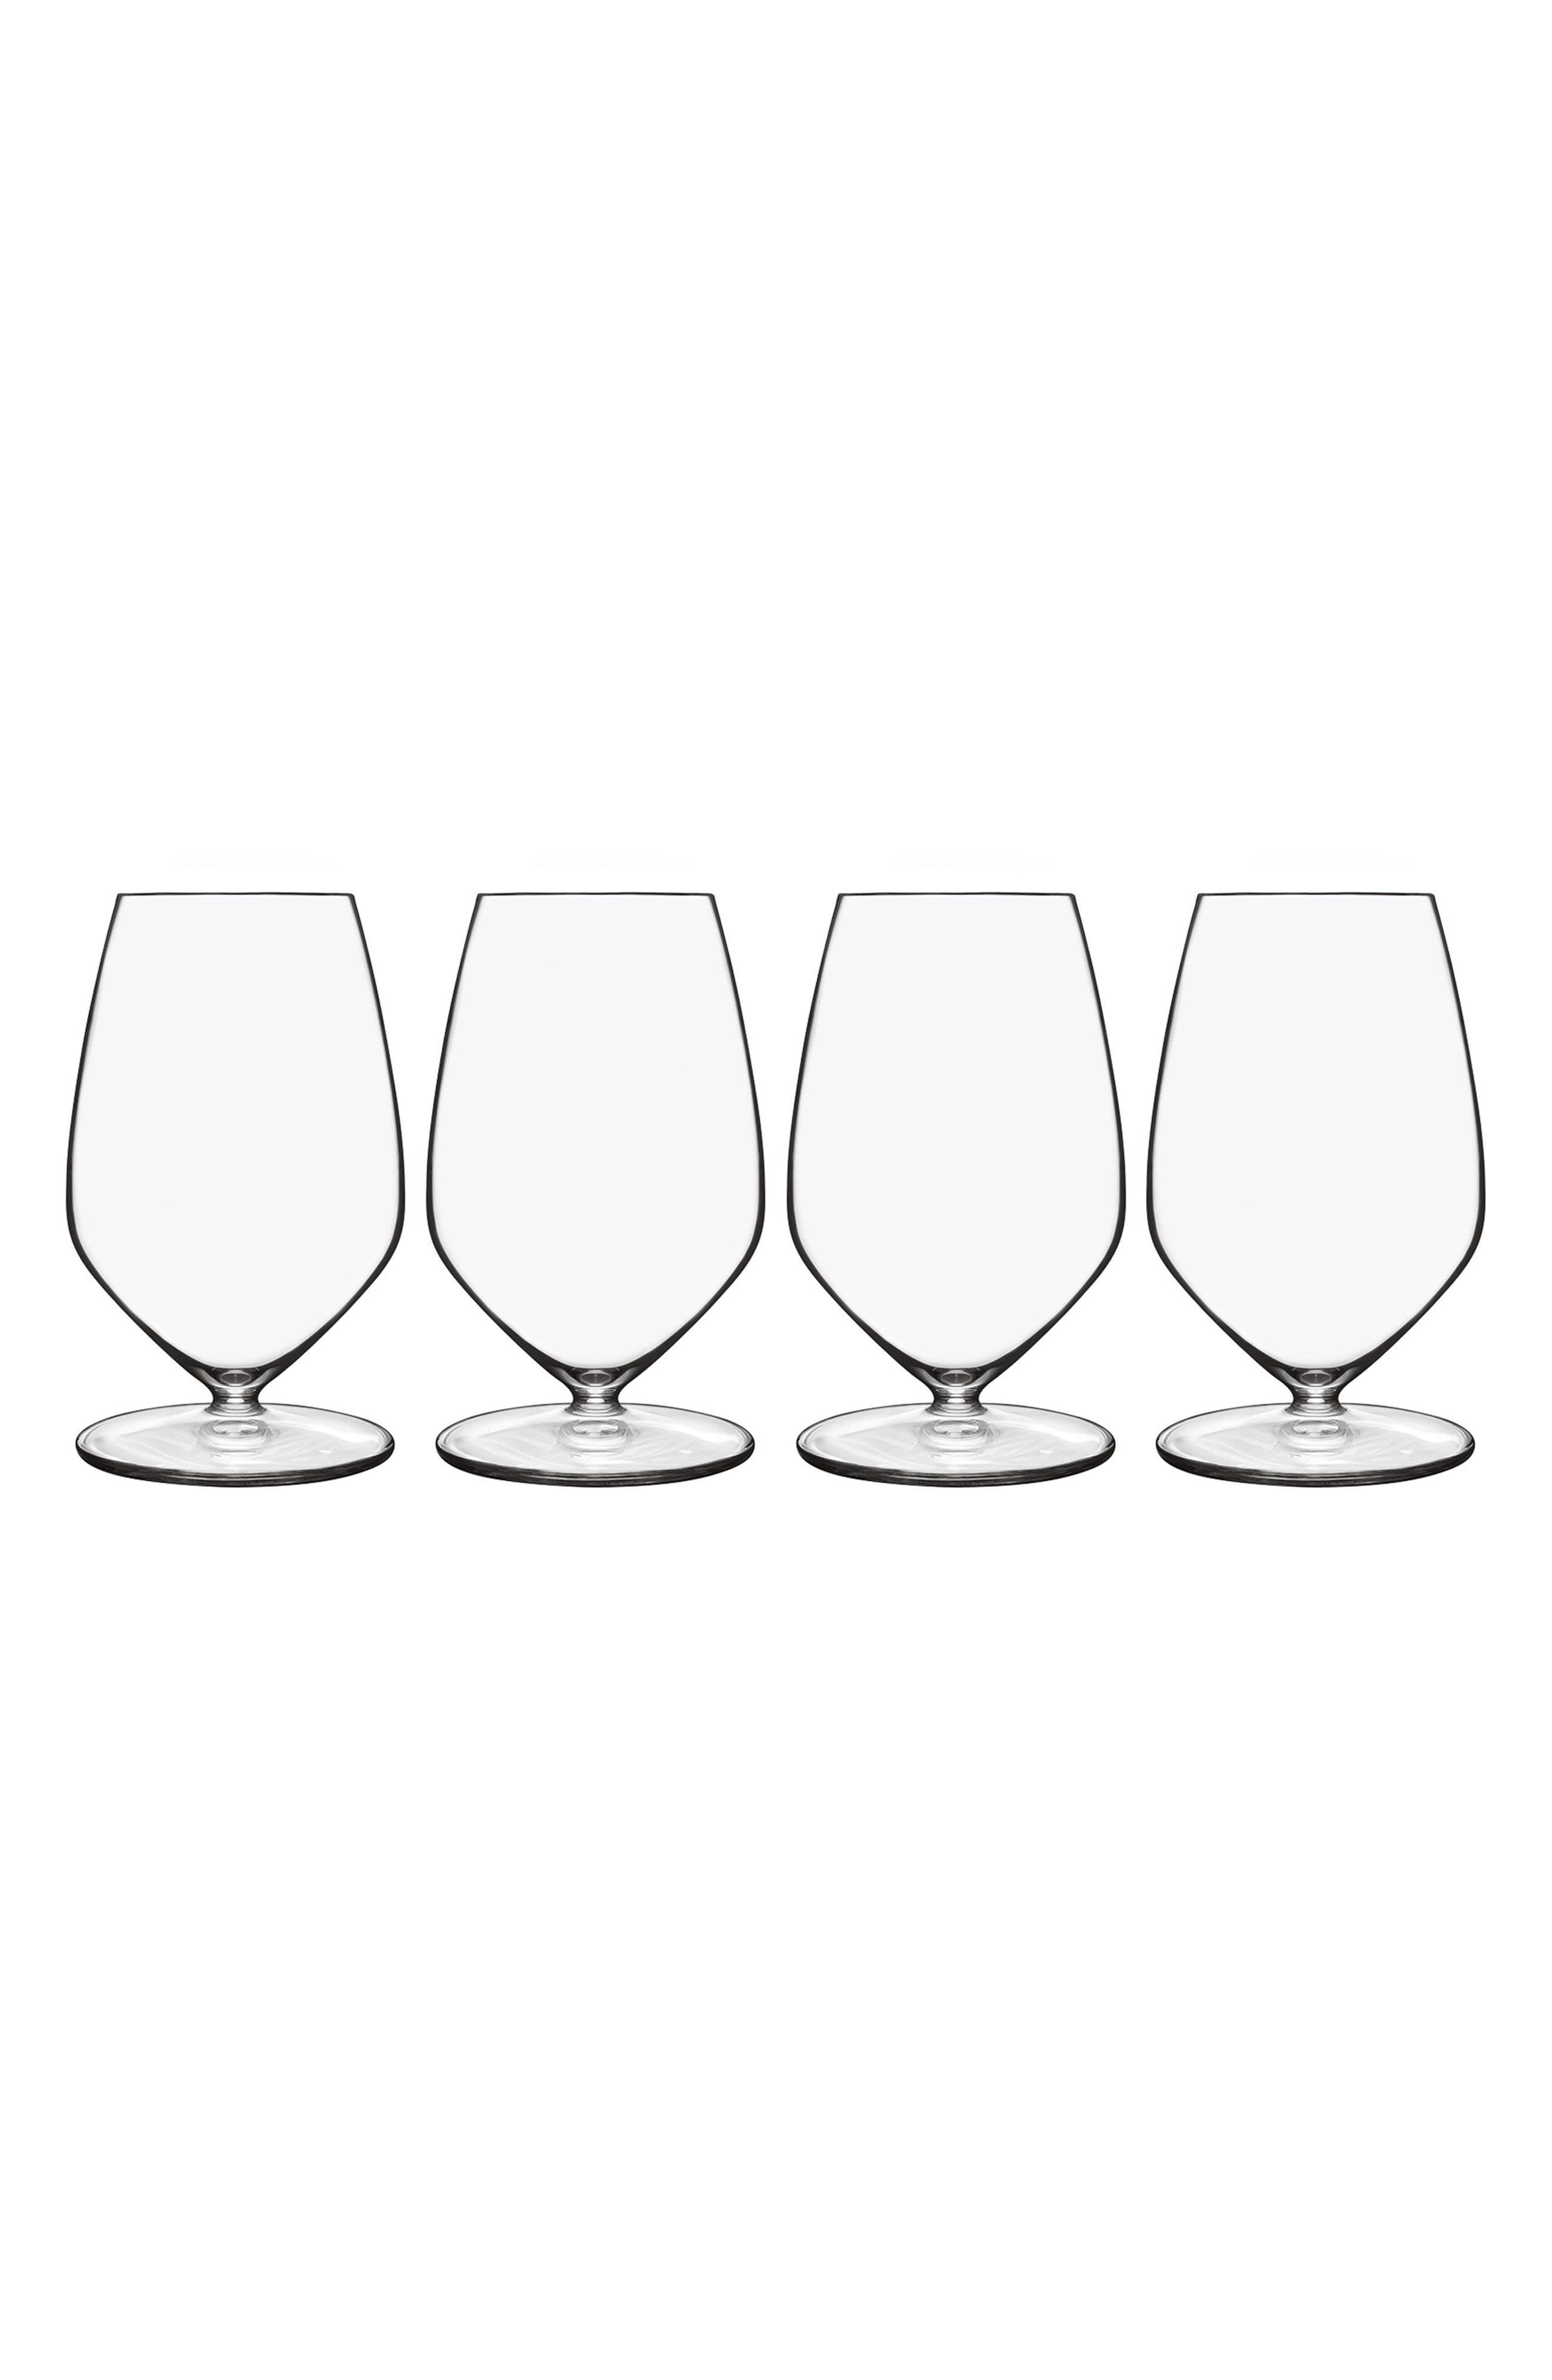 Main Image - Luigi Bormioli T-Glass Set of 4 Riesling Glasses